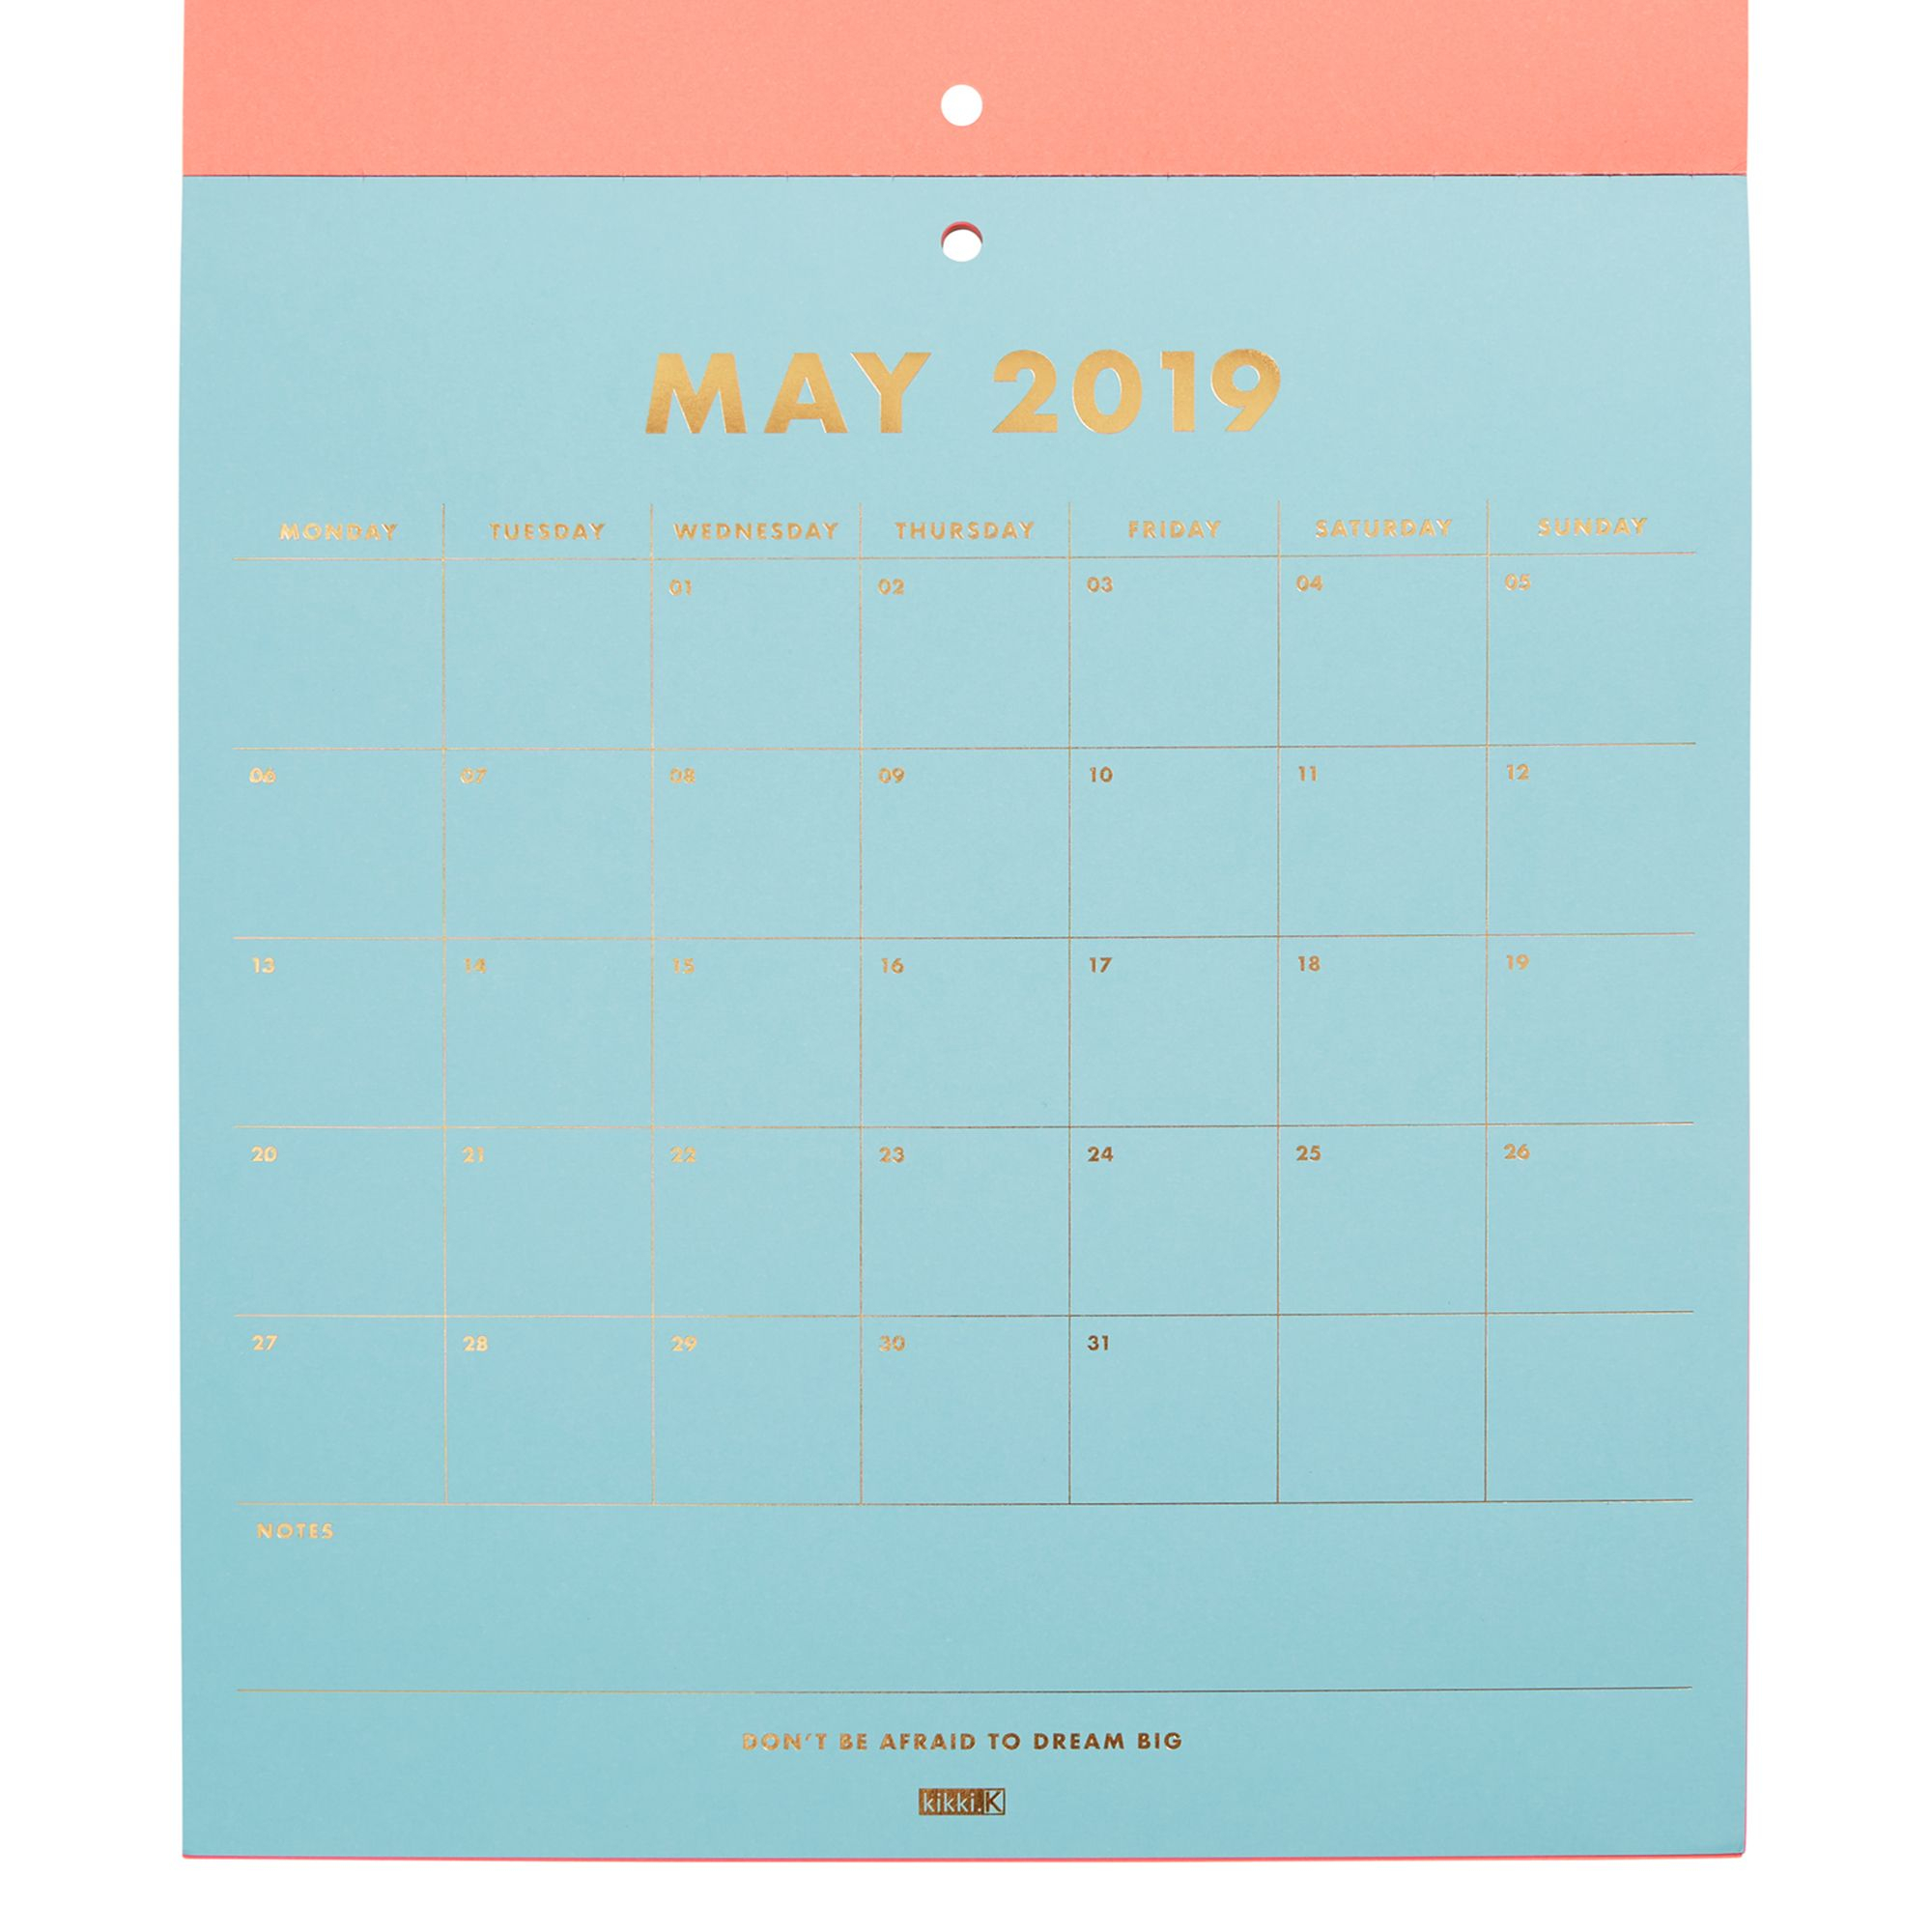 2019 Pad Calendar Neon | Calendars | Kikki.k In 2020 within Wall Calendar Kikki K